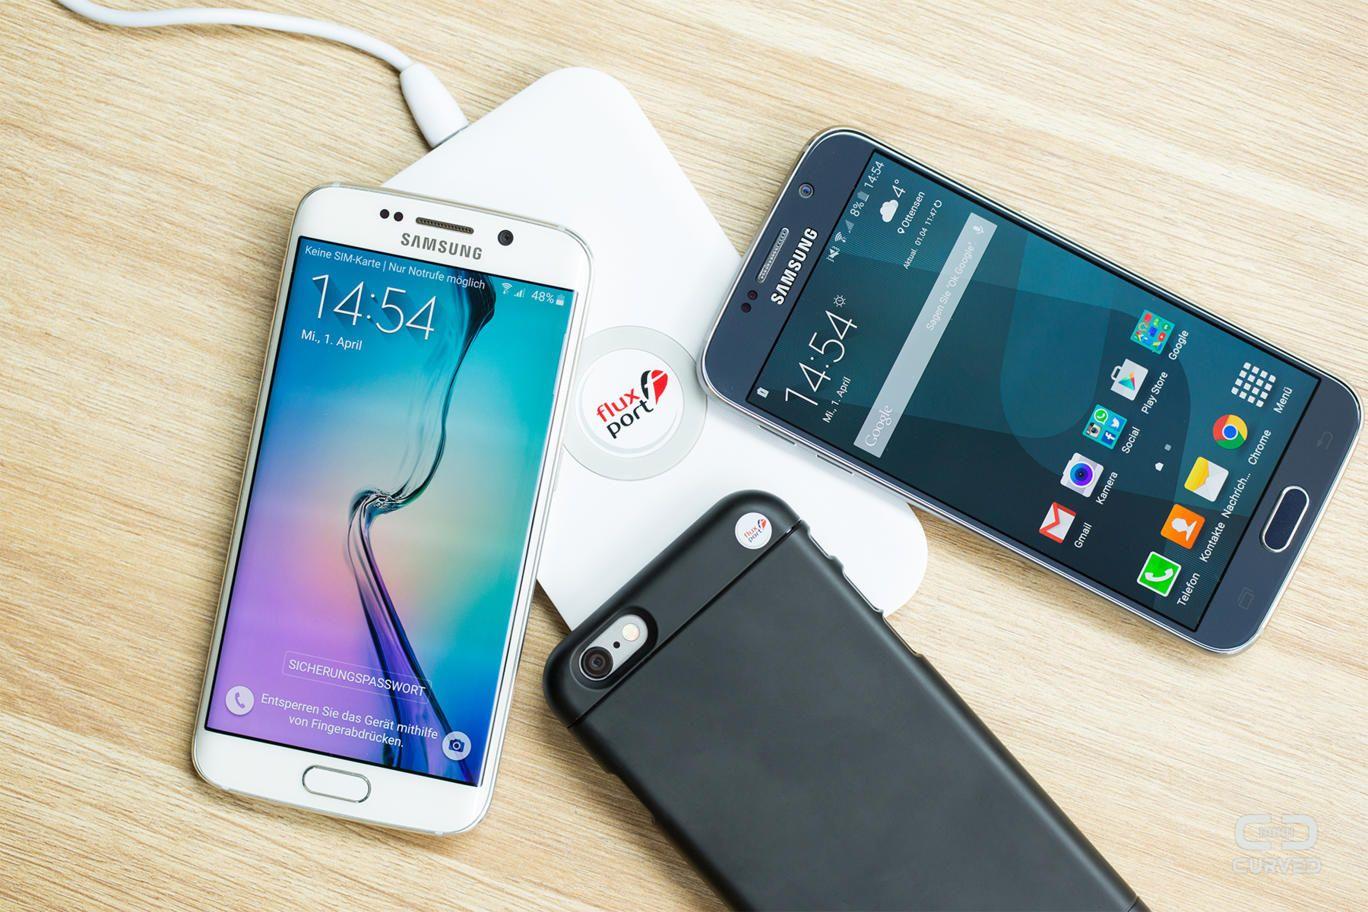 Fluxport Kabelloses Laden Fur Galaxy S6 Und Iphone 6 Teknoloji Ordu Ve Telefonlar